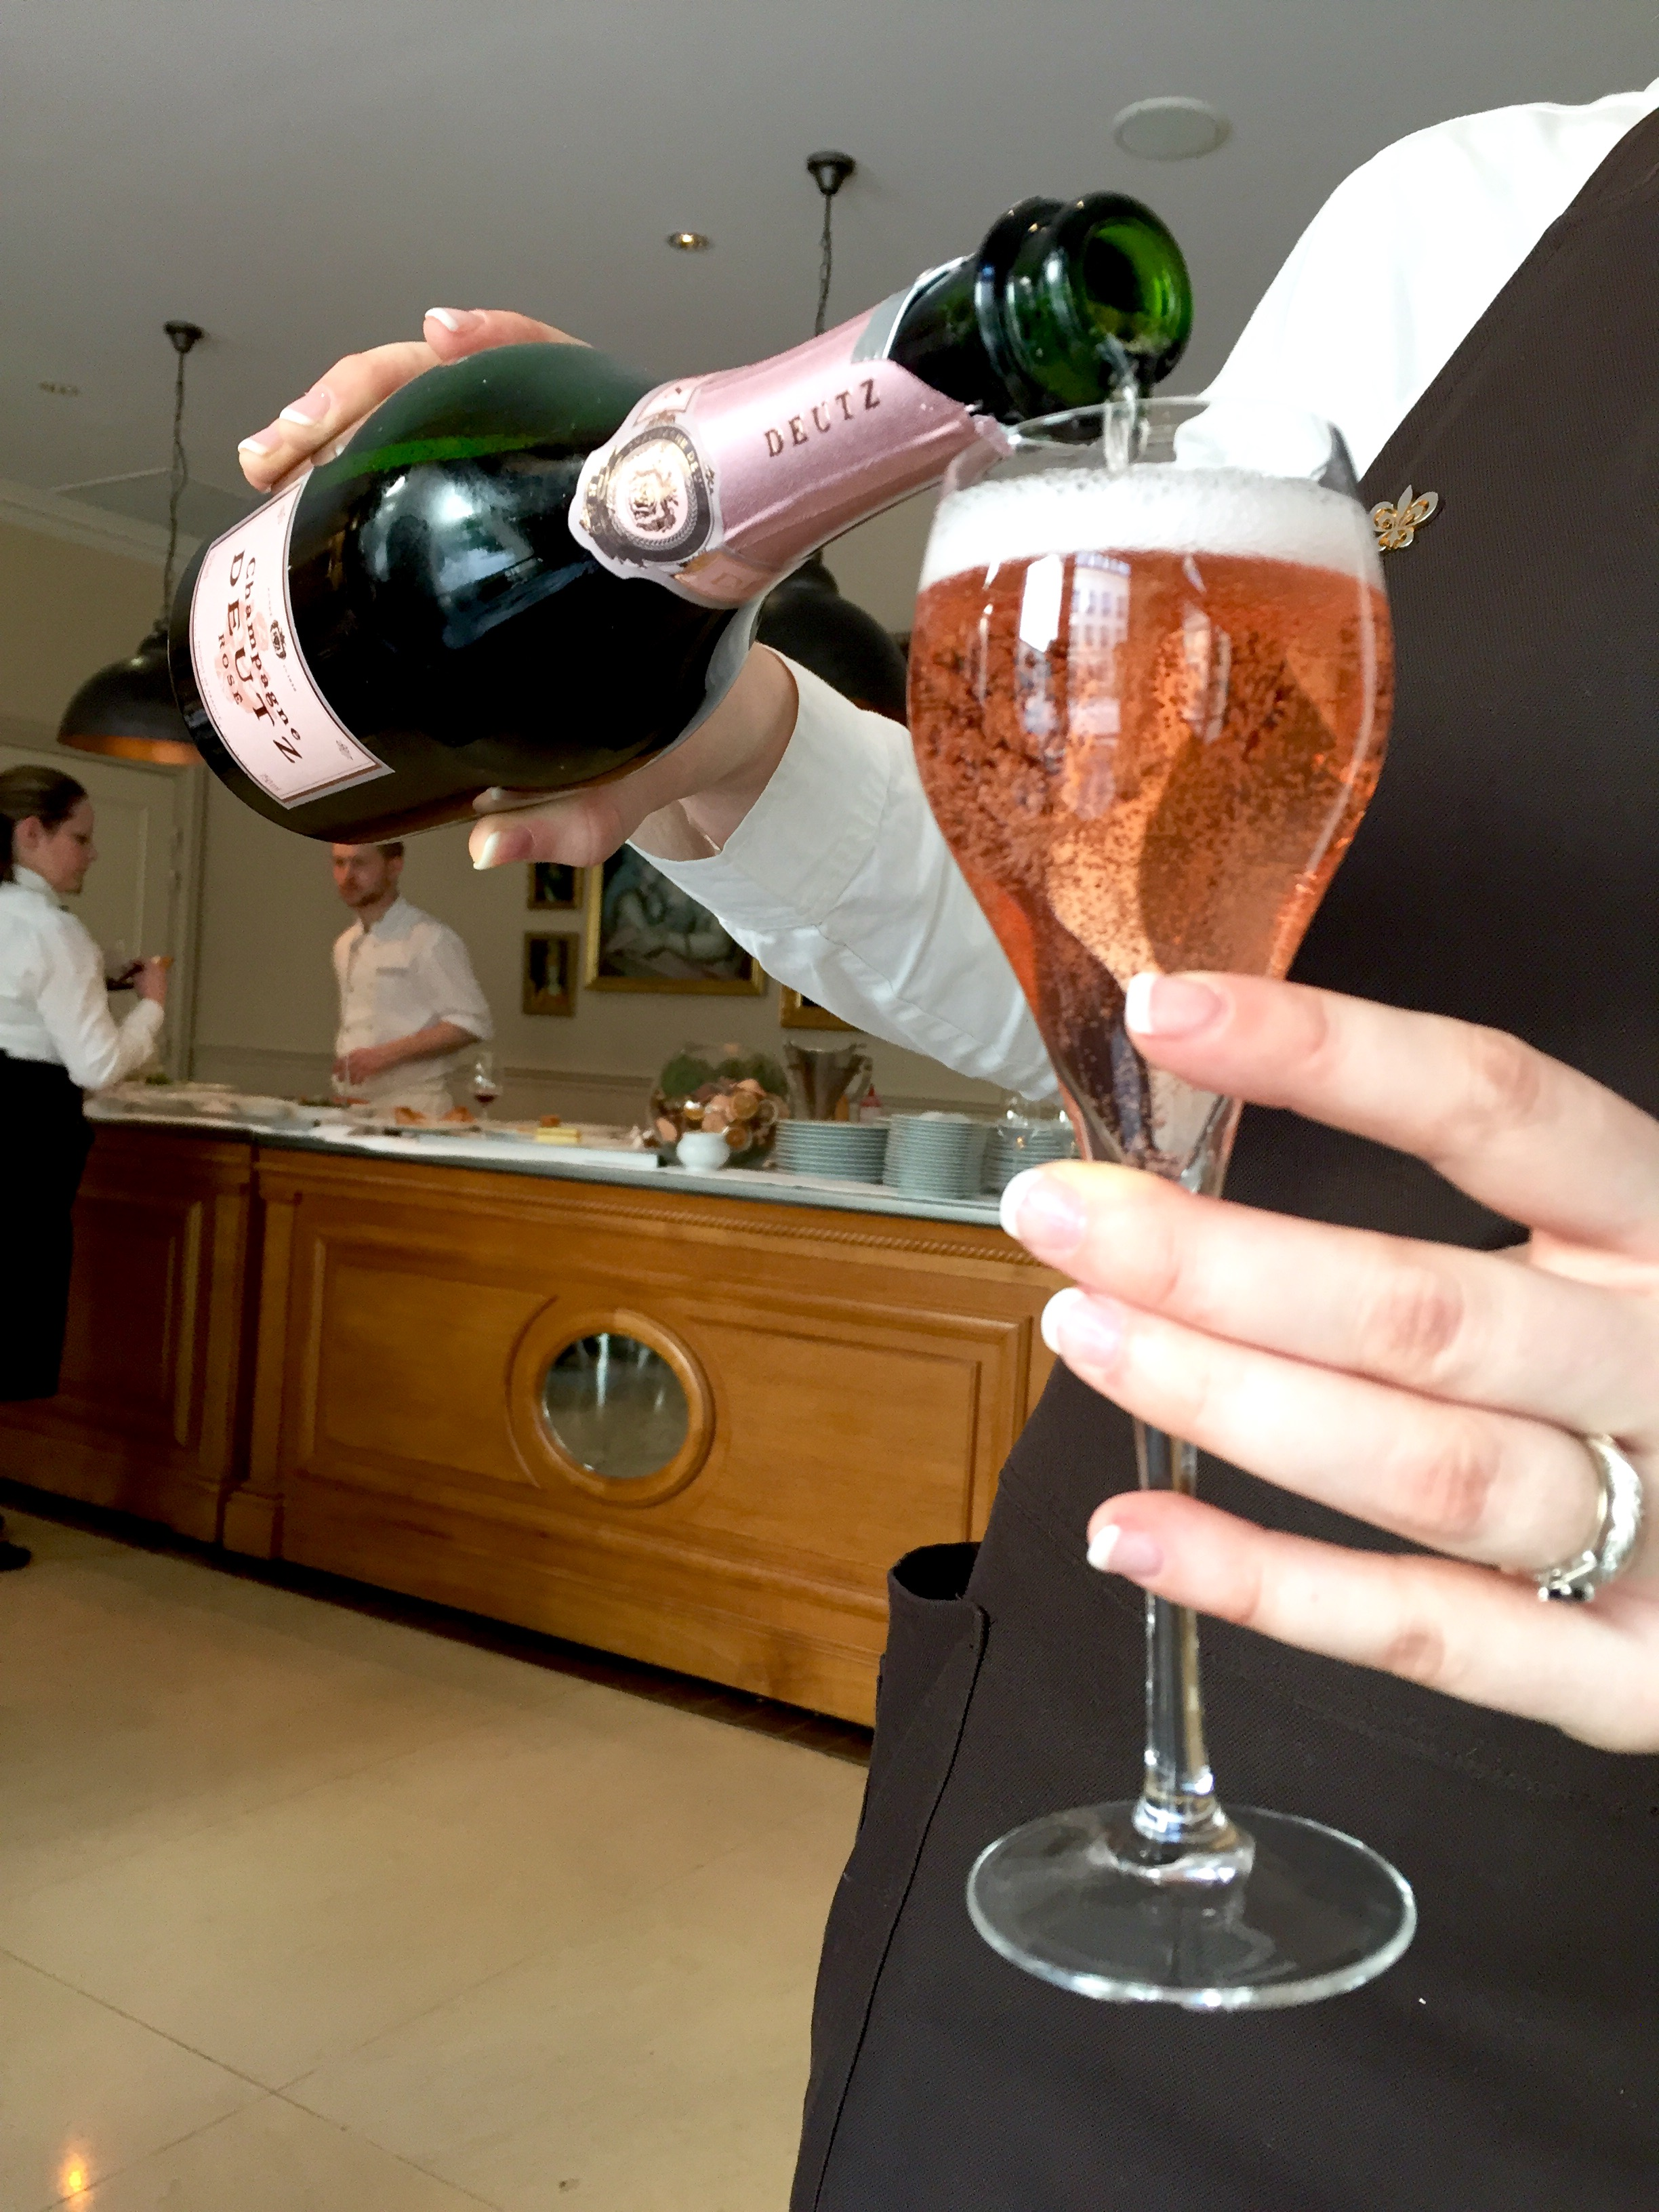 Champagne Le Jardin d'hiver Restaurant Chantilly France